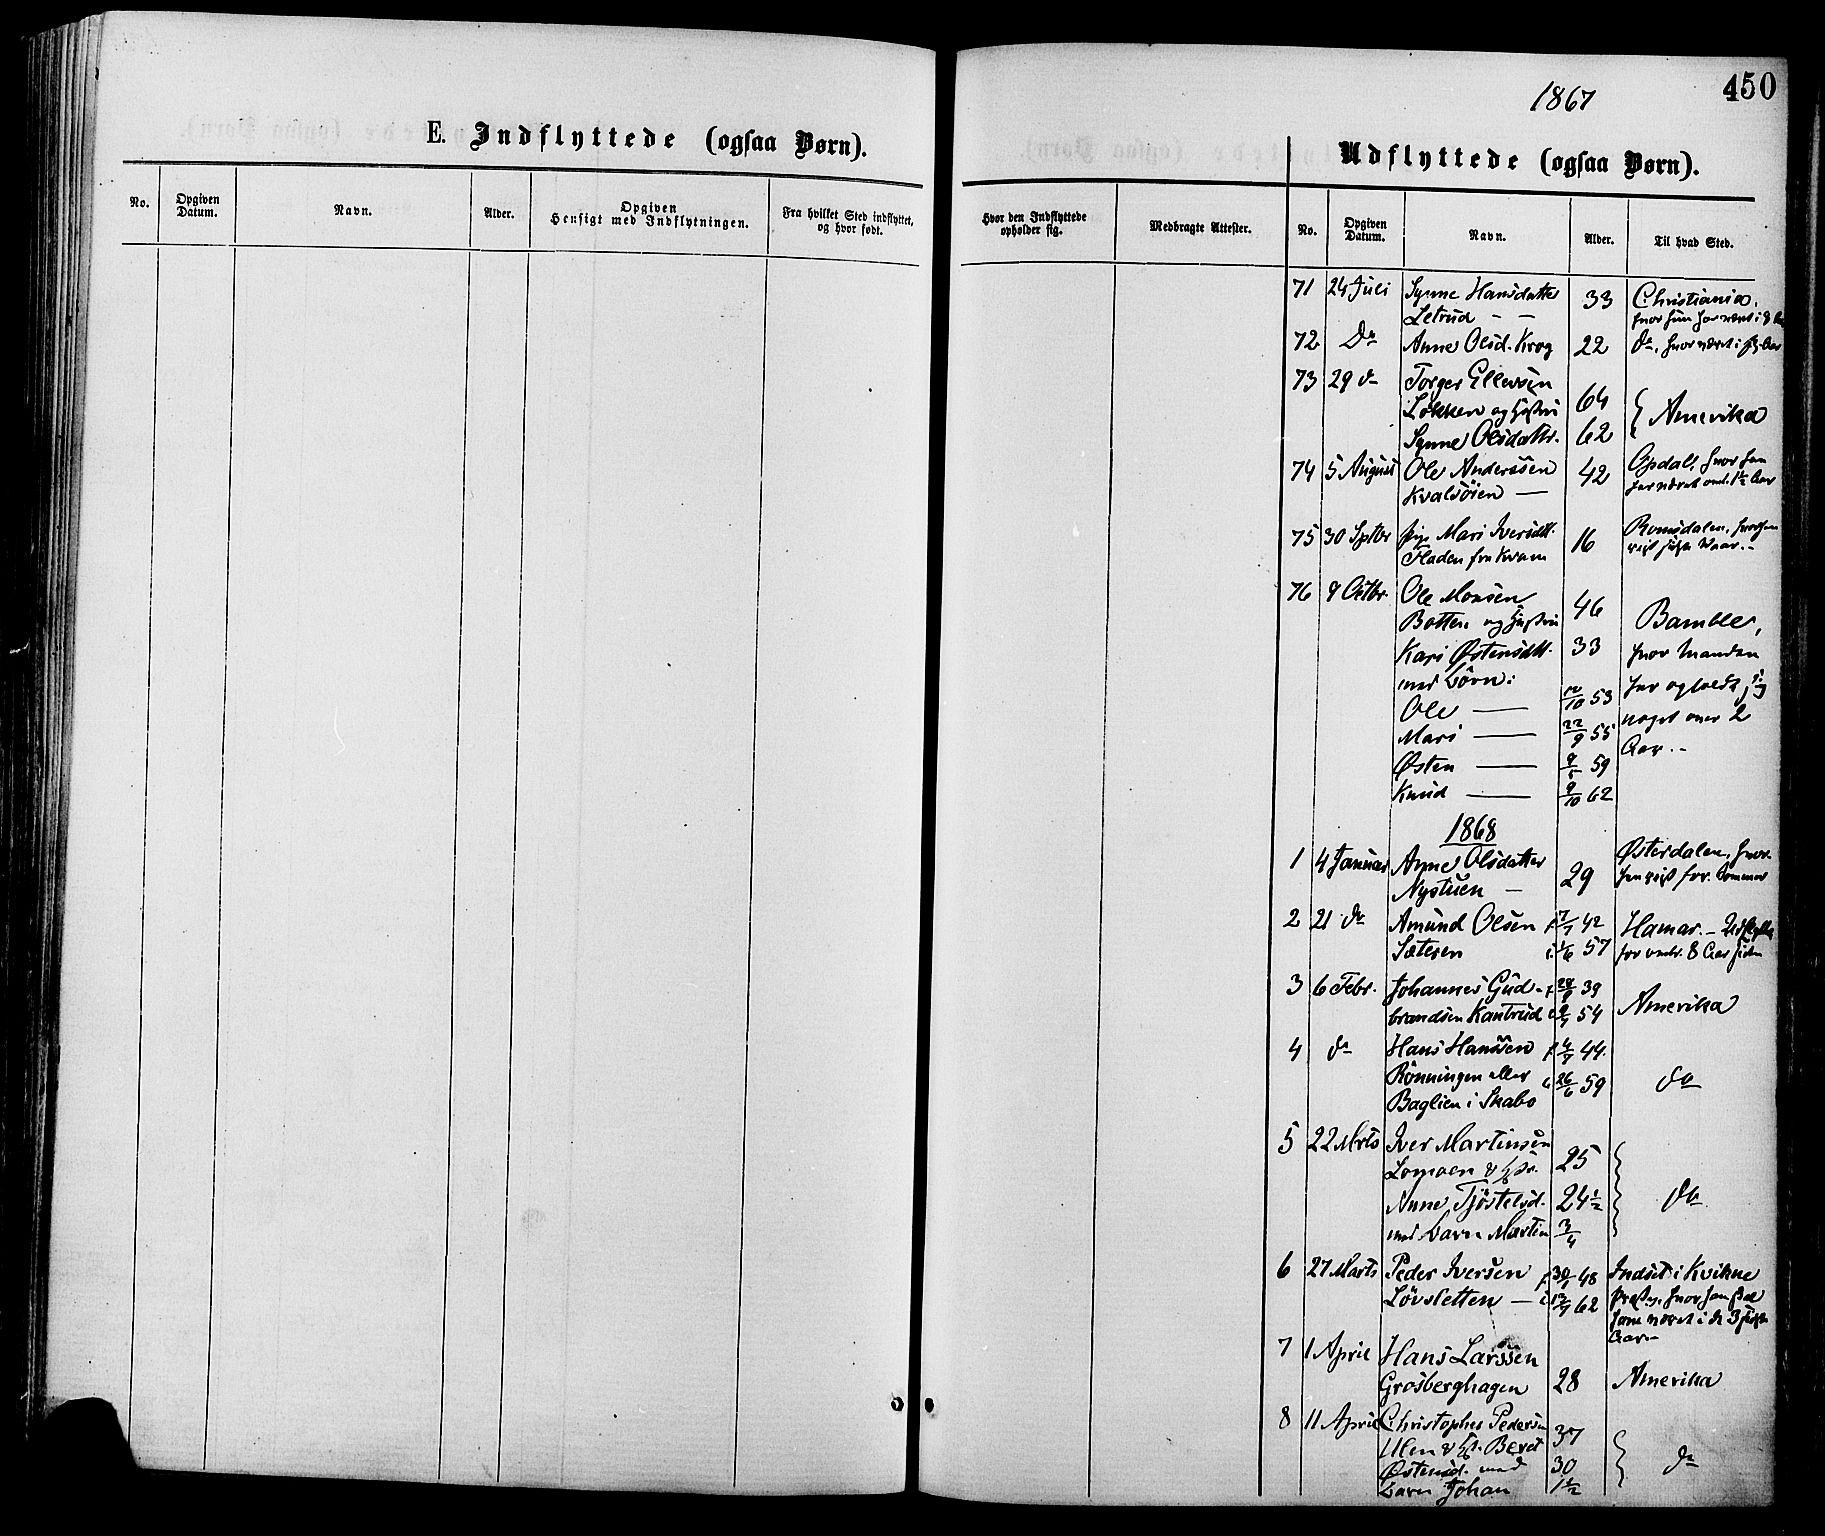 SAH, Nord-Fron prestekontor, Ministerialbok nr. 2, 1865-1883, s. 450